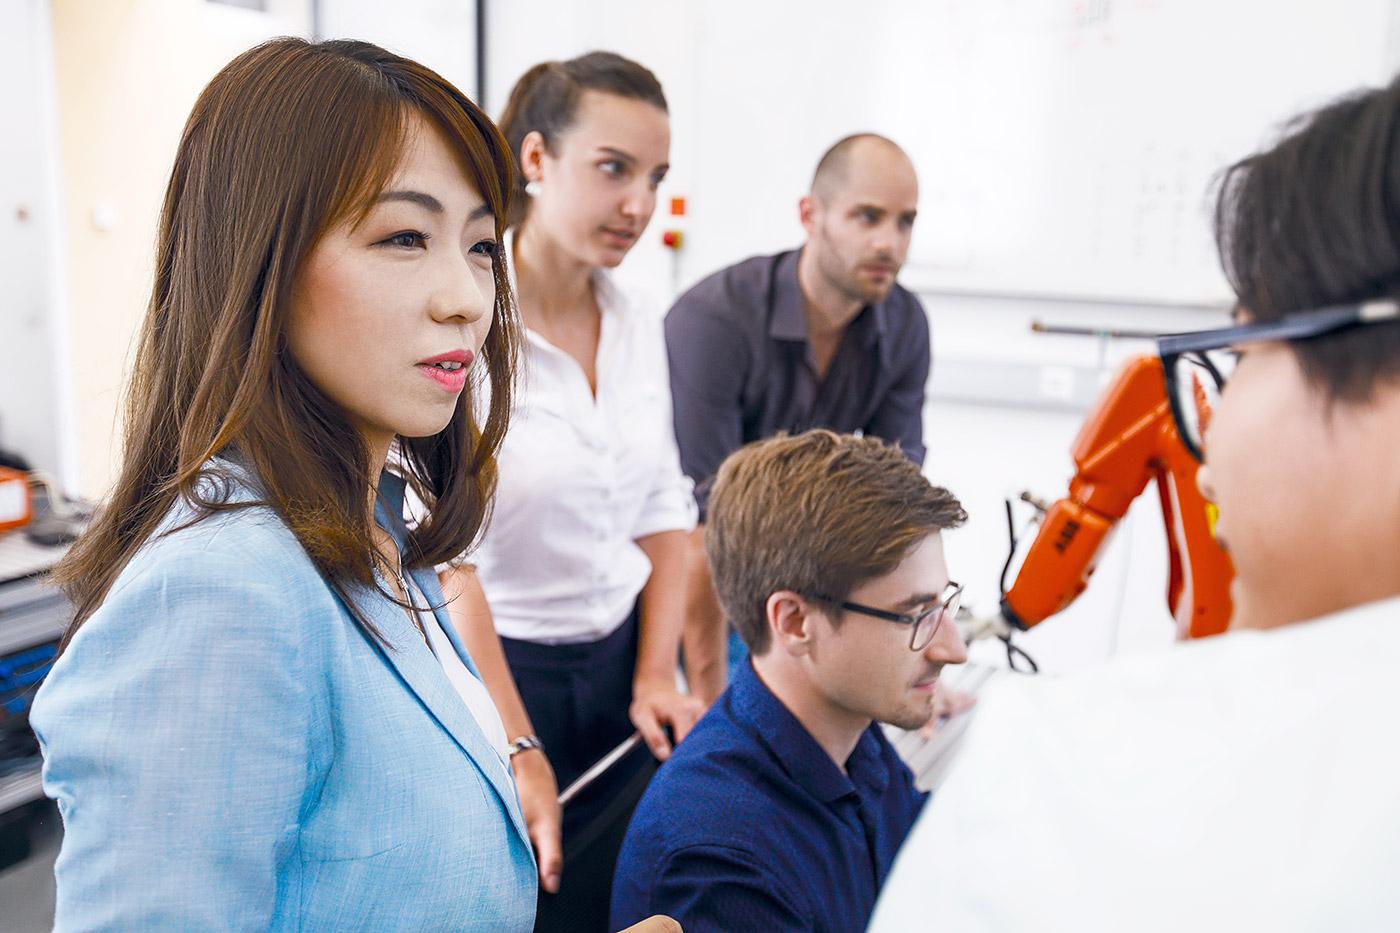 studenten programmieren roboter